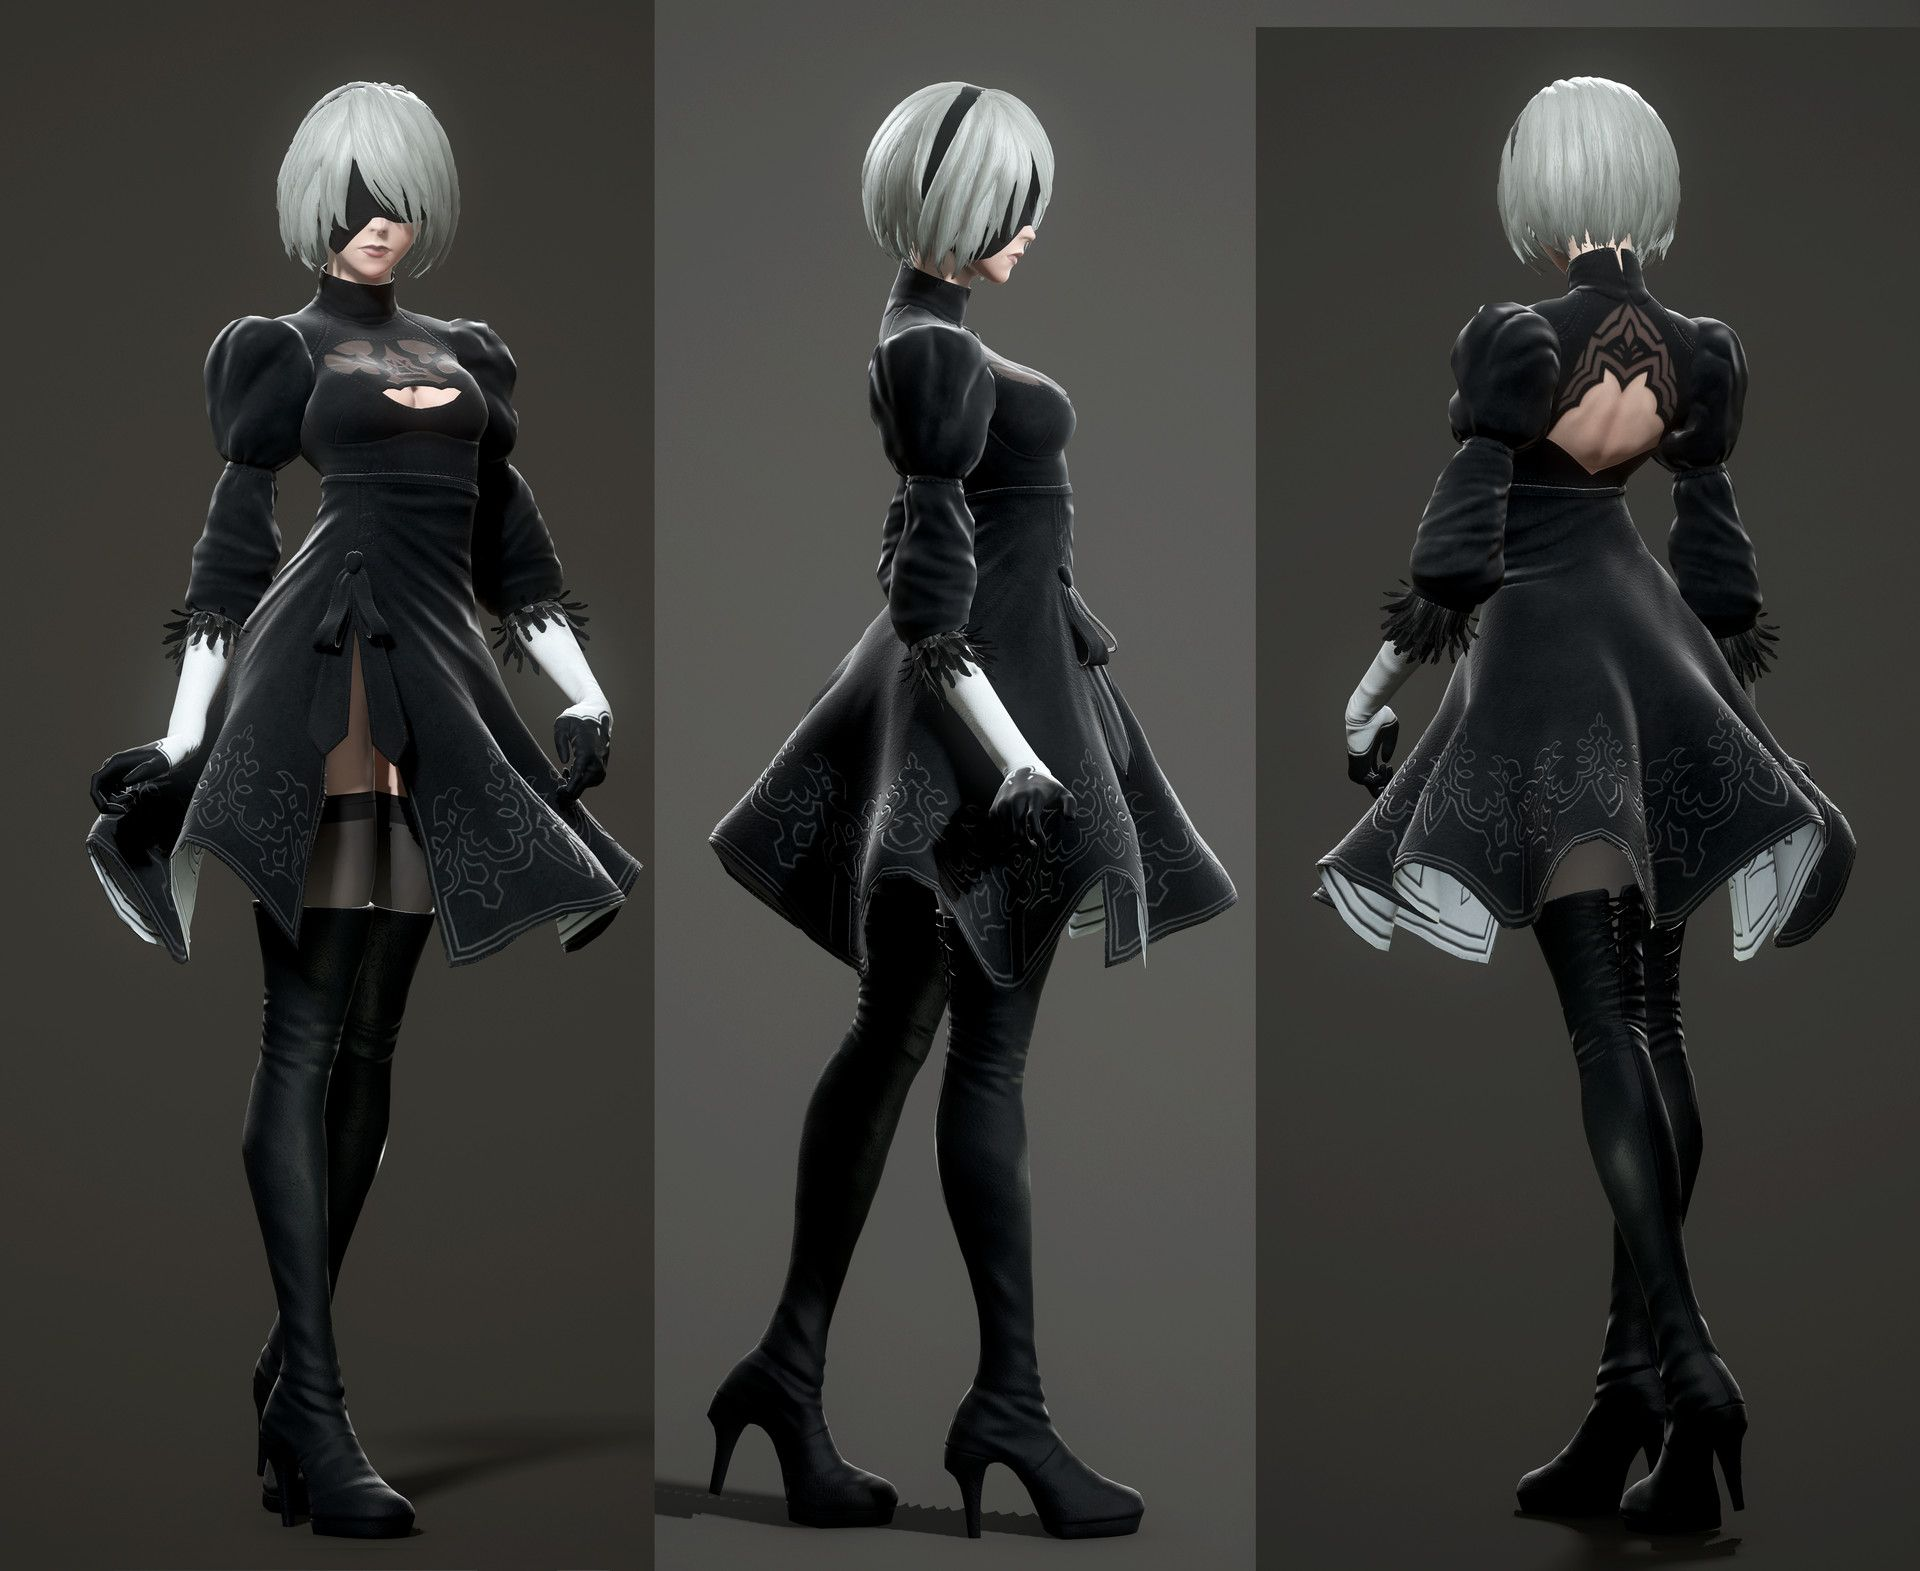 Character Design Nier Automata : Artstation fan art b nier automata takumi oniki